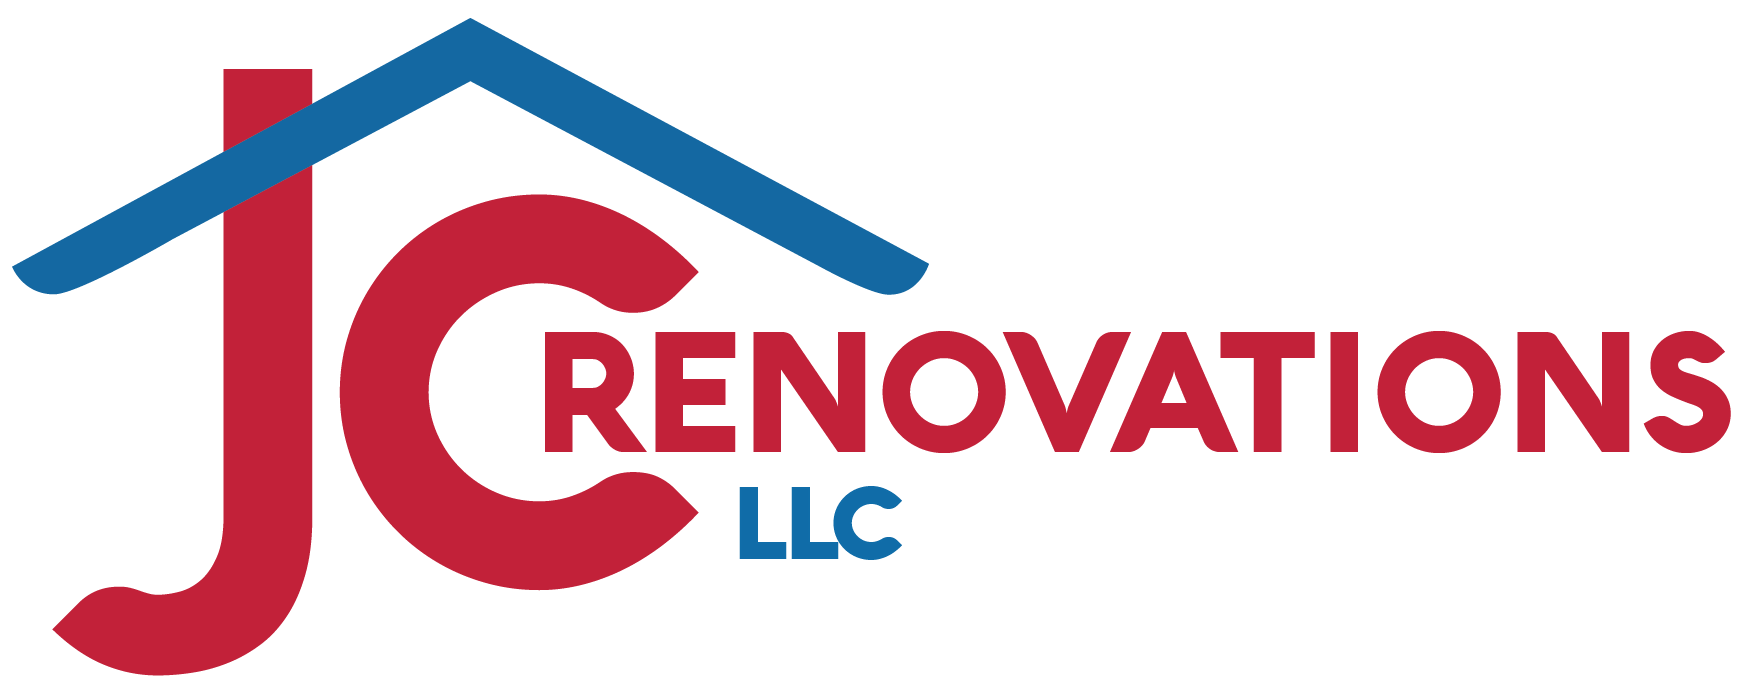 JC Renovations LLC